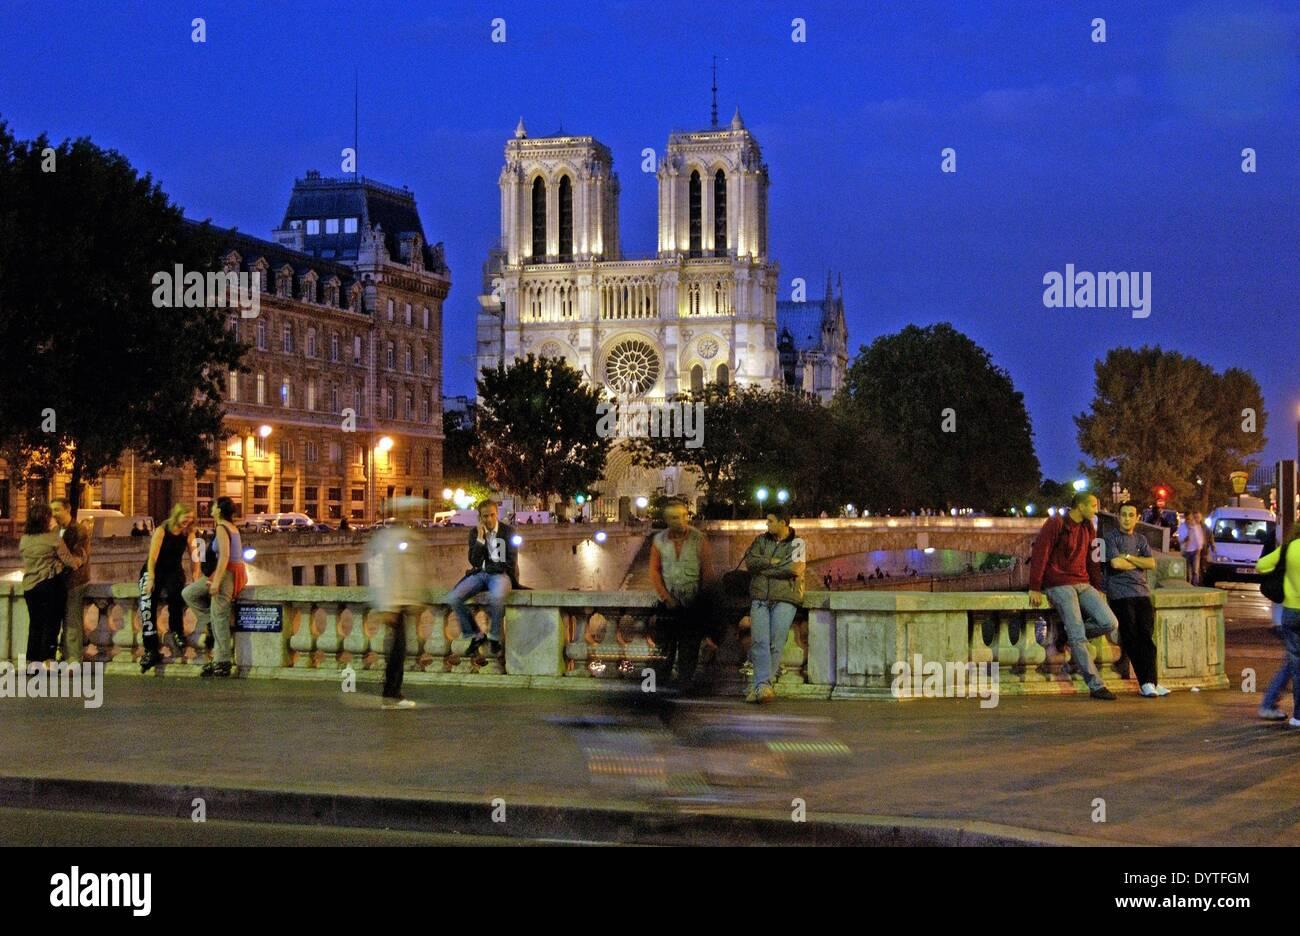 Paris at night, 2005 - Stock Image